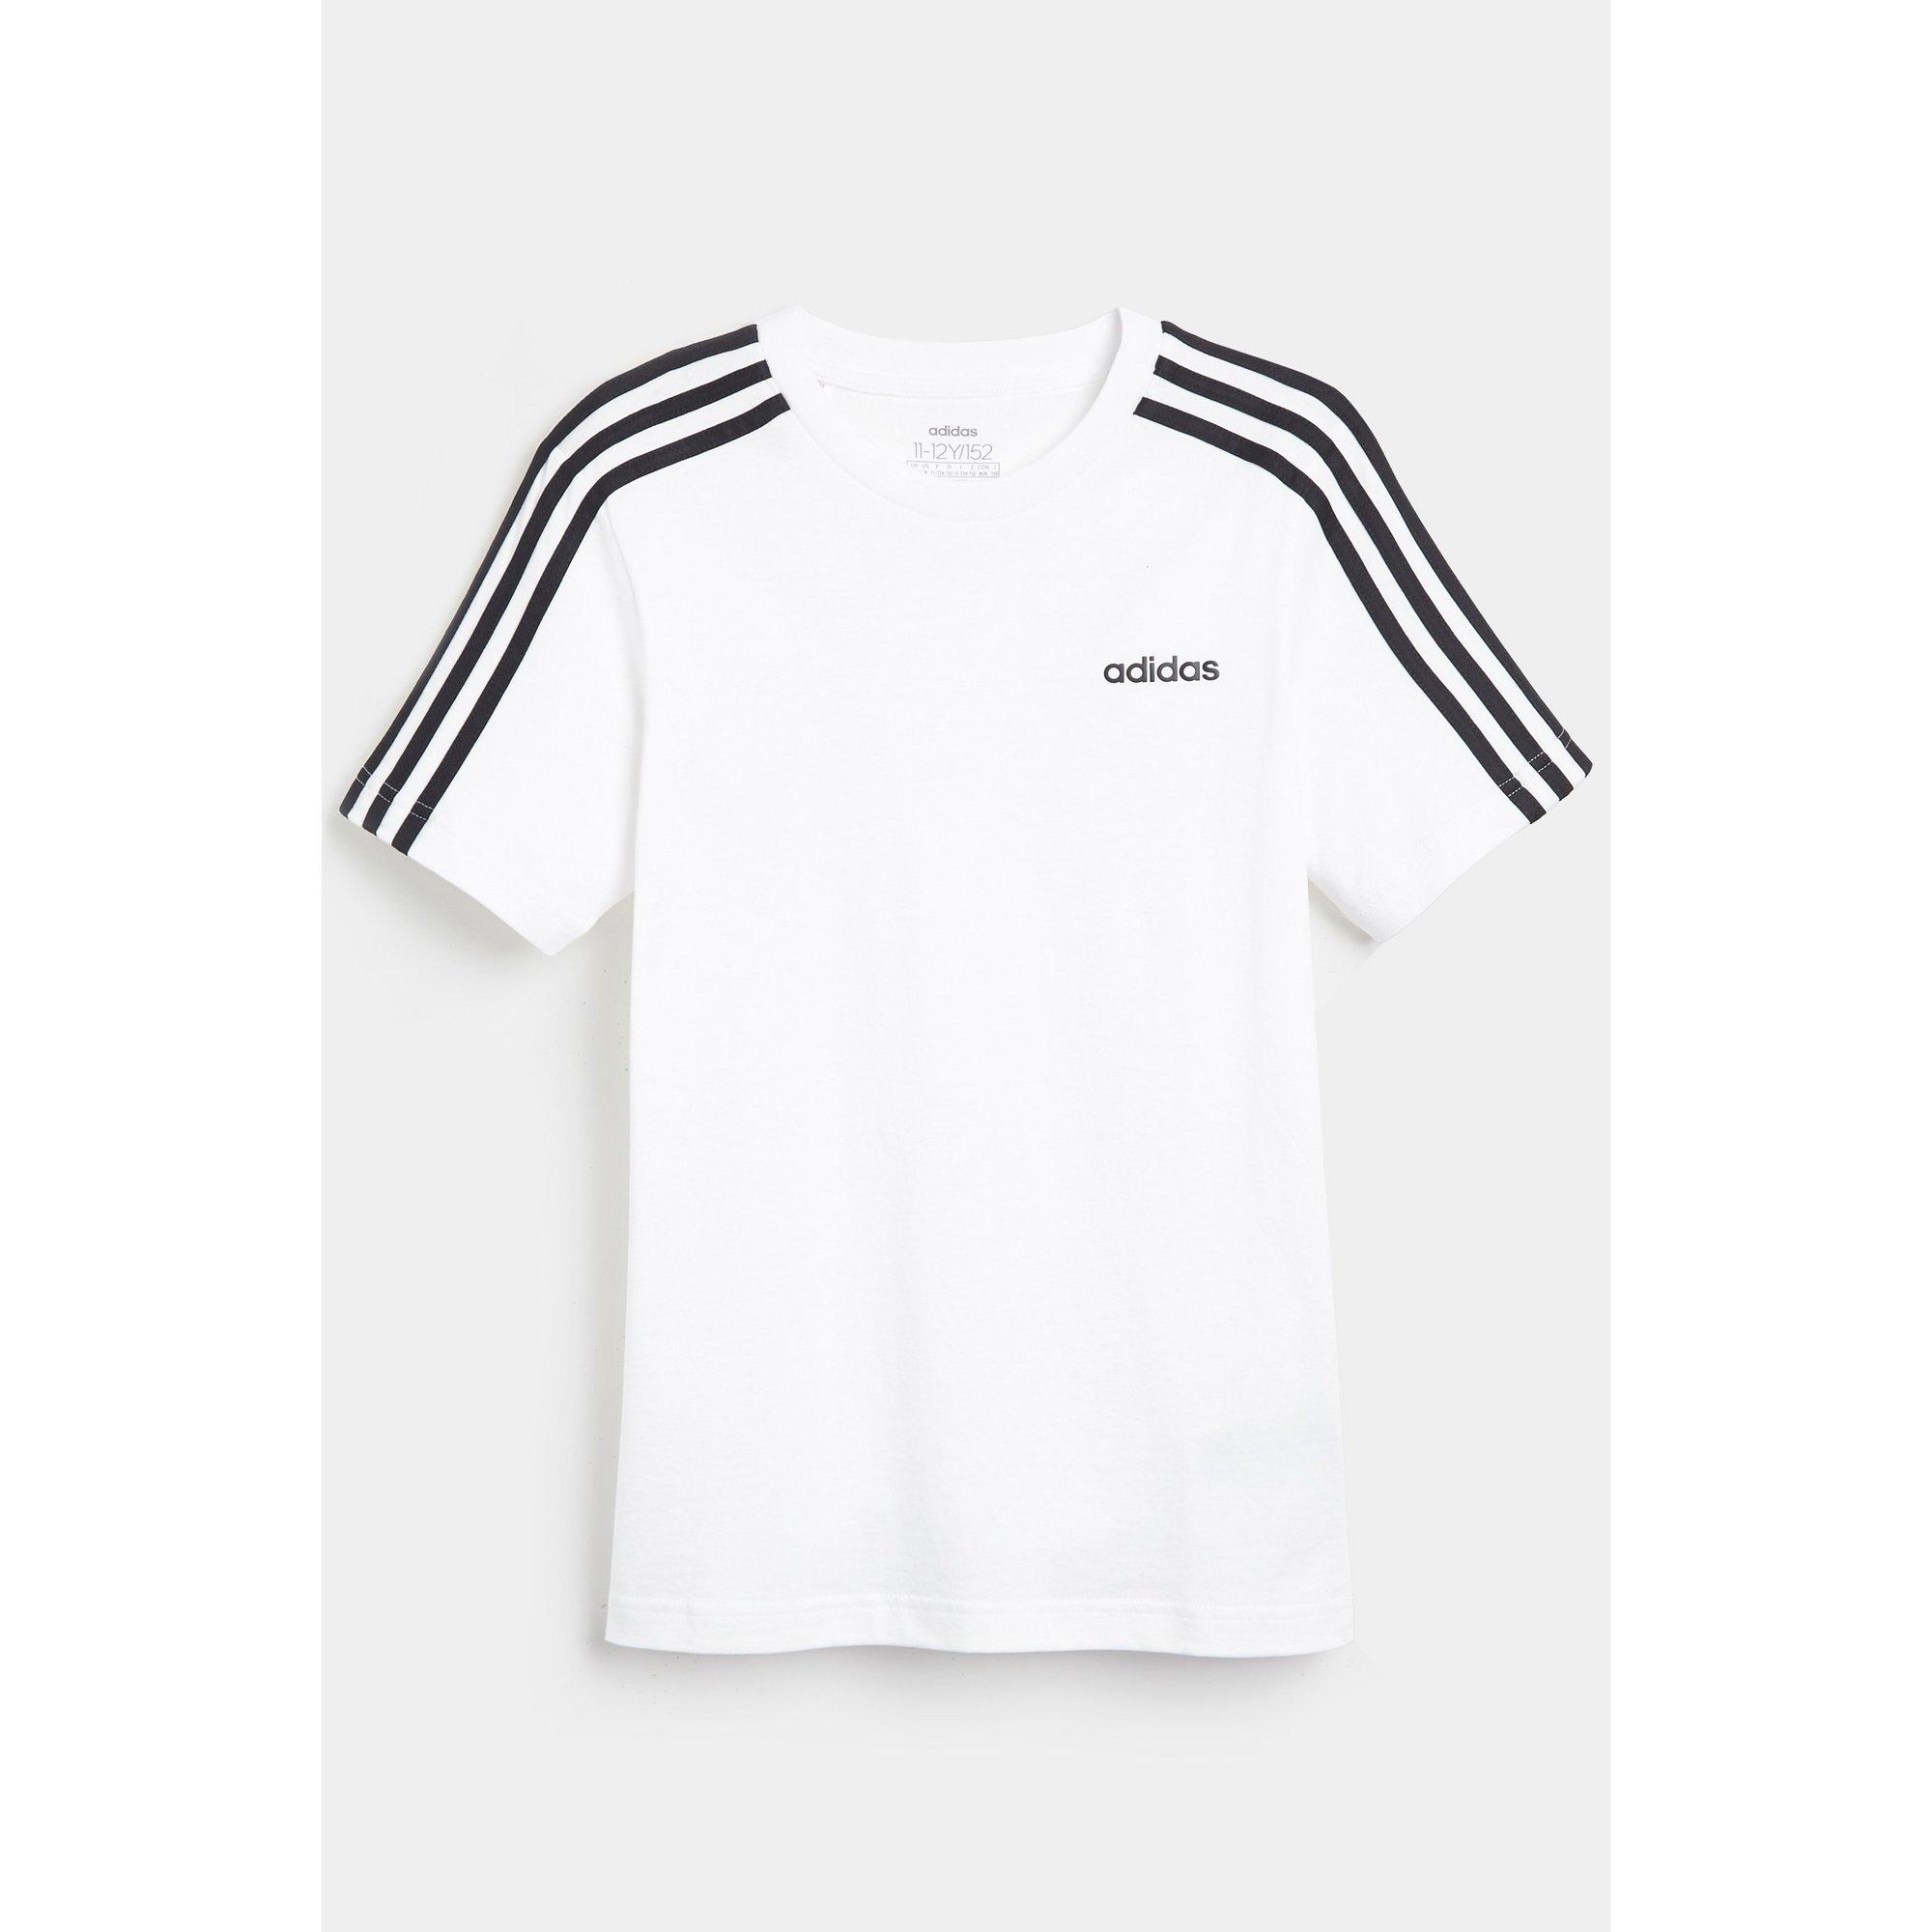 Image of Boys adidas Essentials White T-Shirt